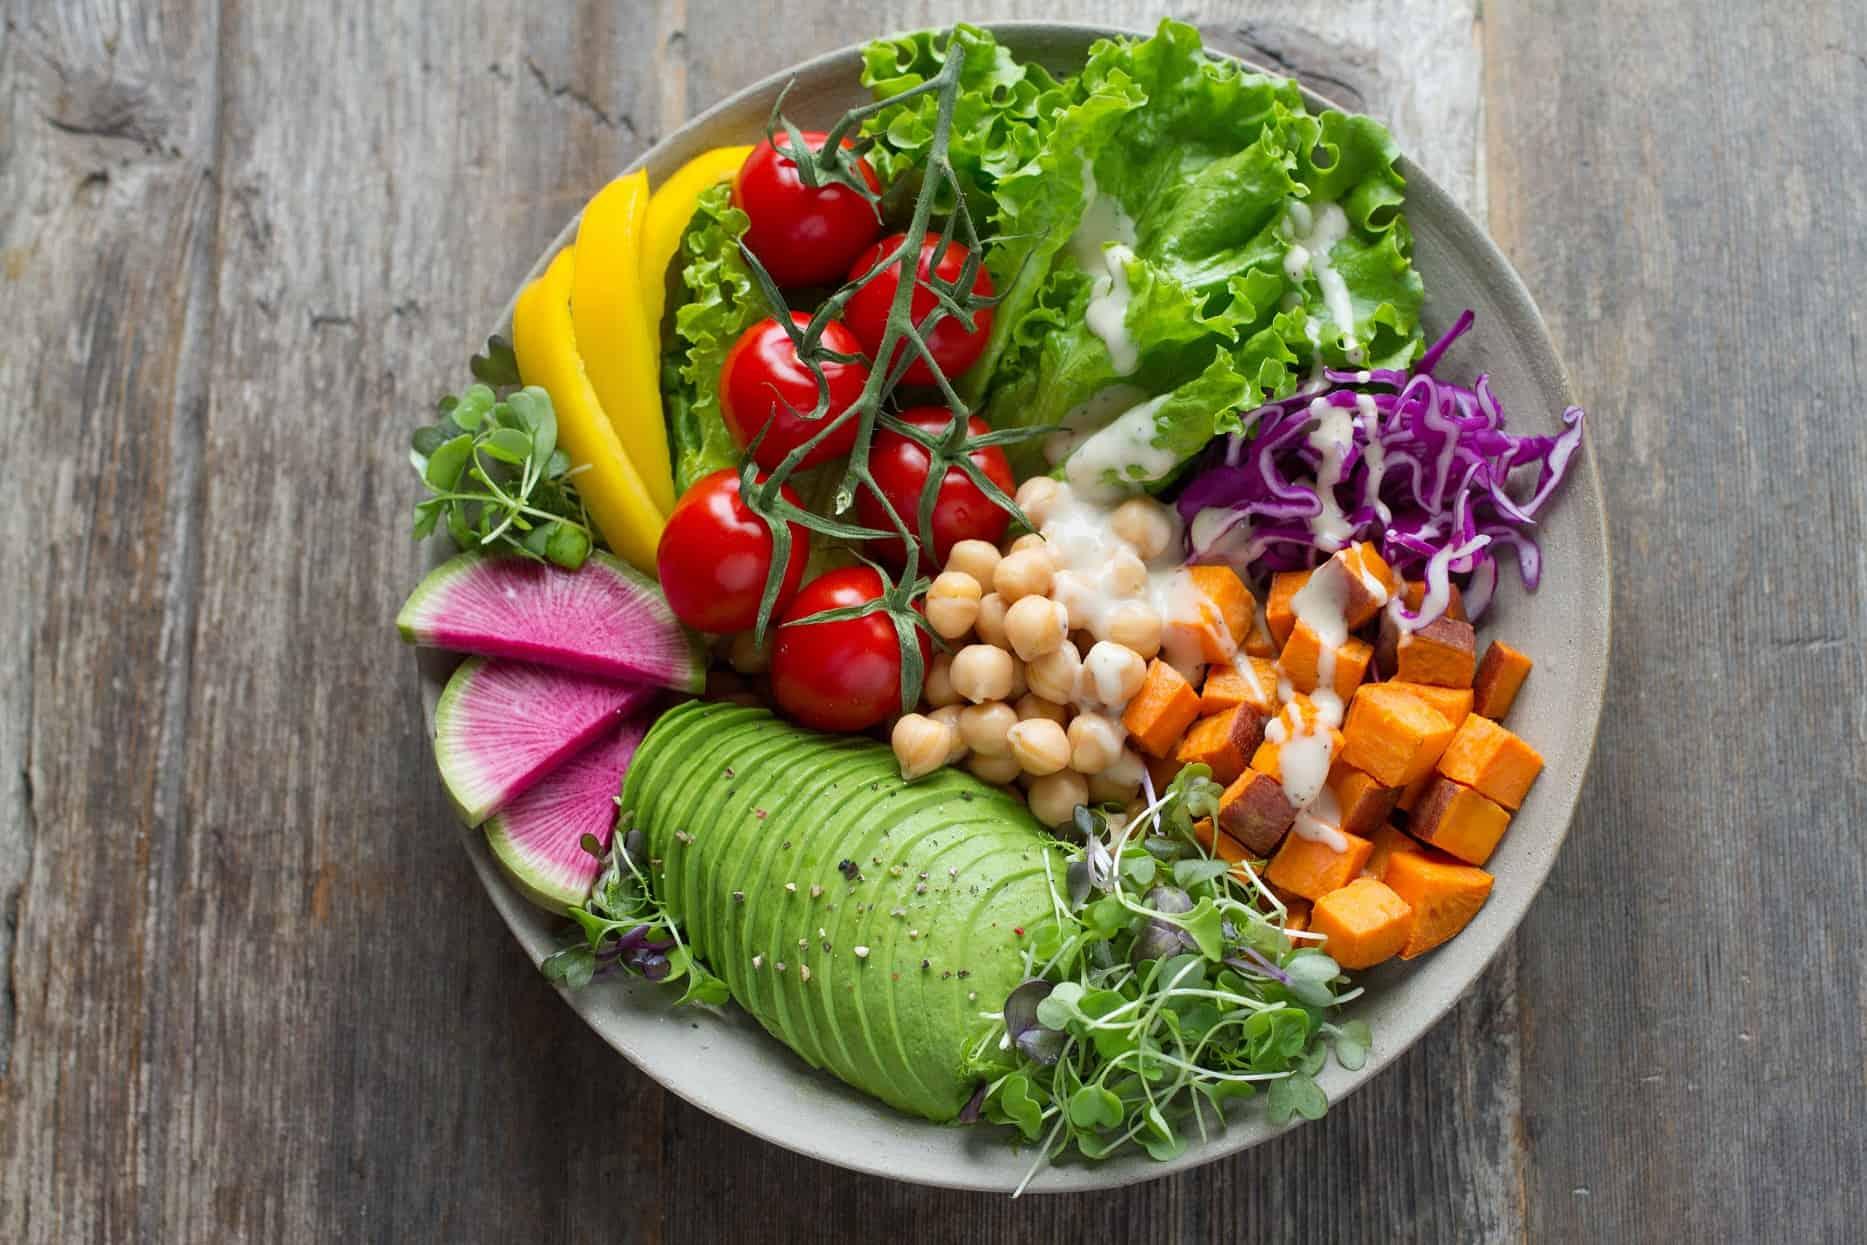 Vegan Grocery List Not as Good As A Vegetarian One! - Listonic